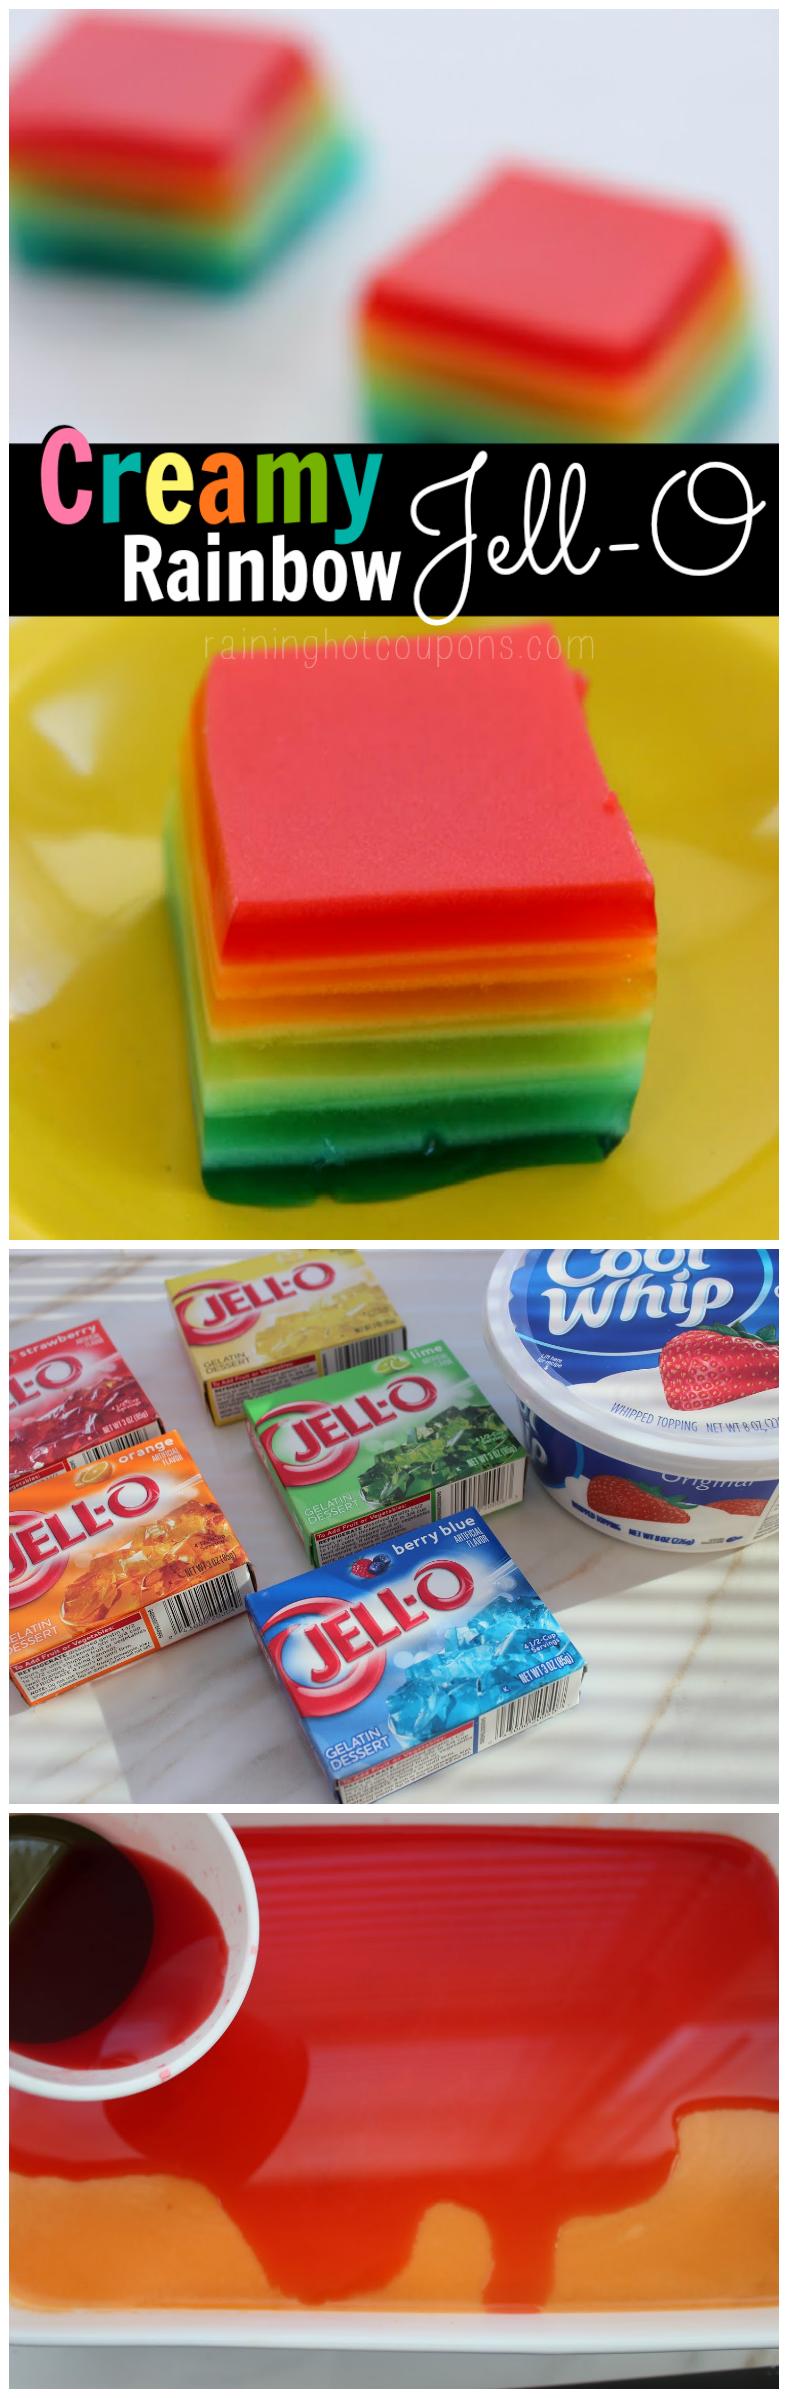 rainbow jello collage.png